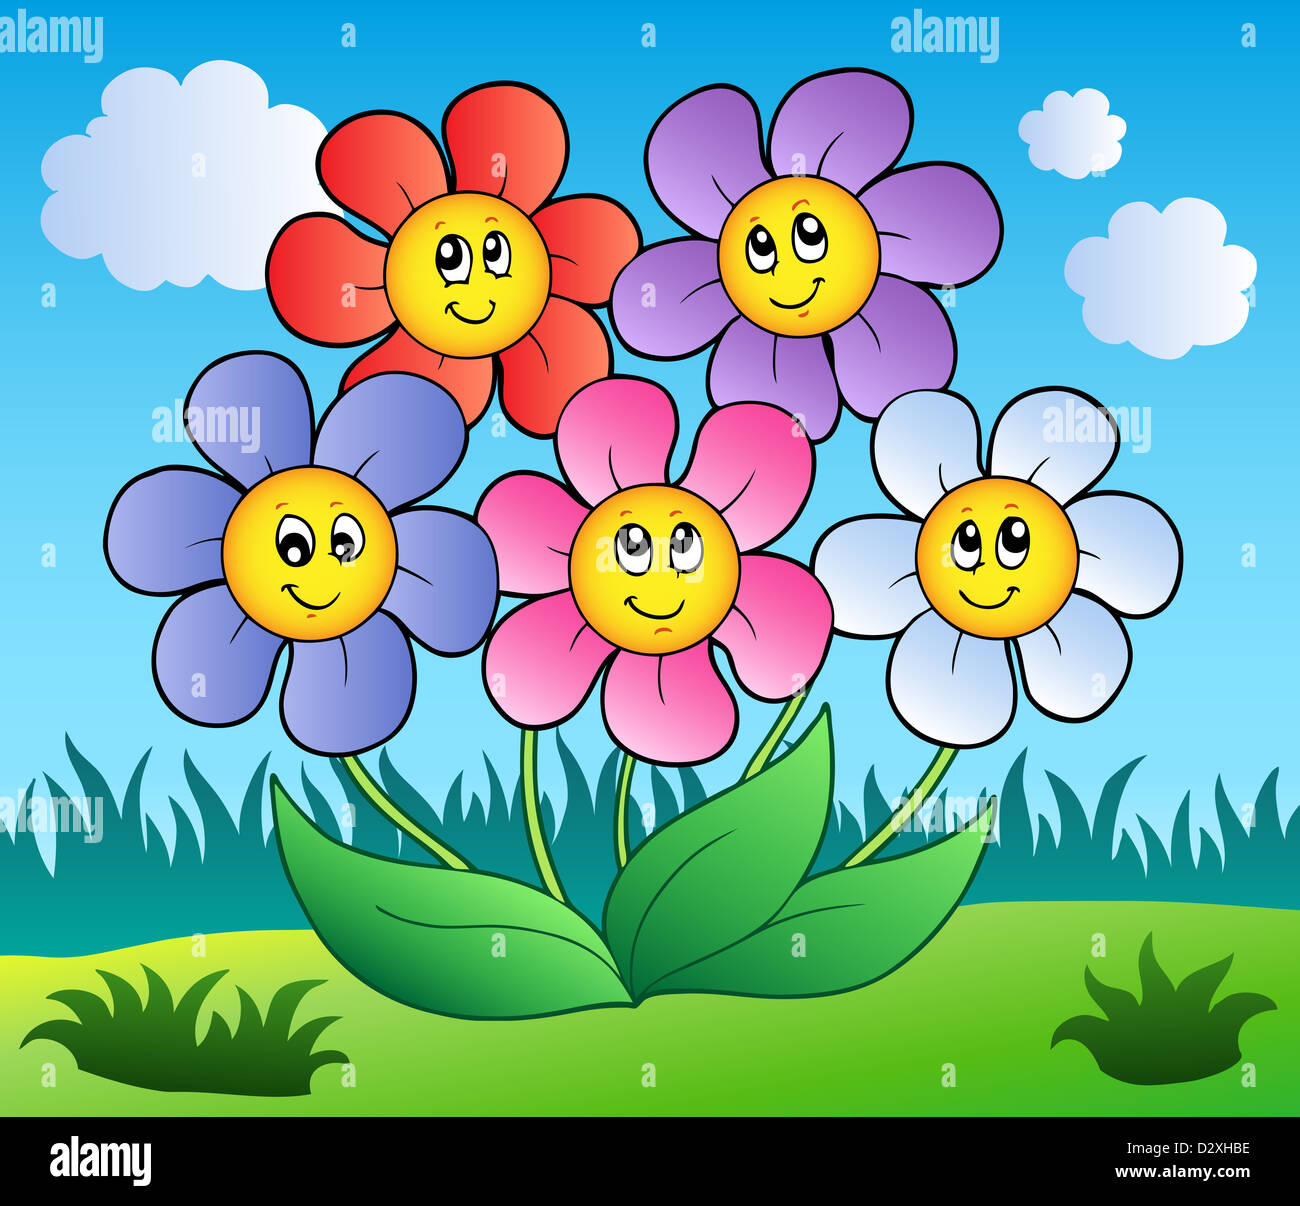 Five Cartoon Flowers On Meadow Color Illustration Stock Photo Alamy